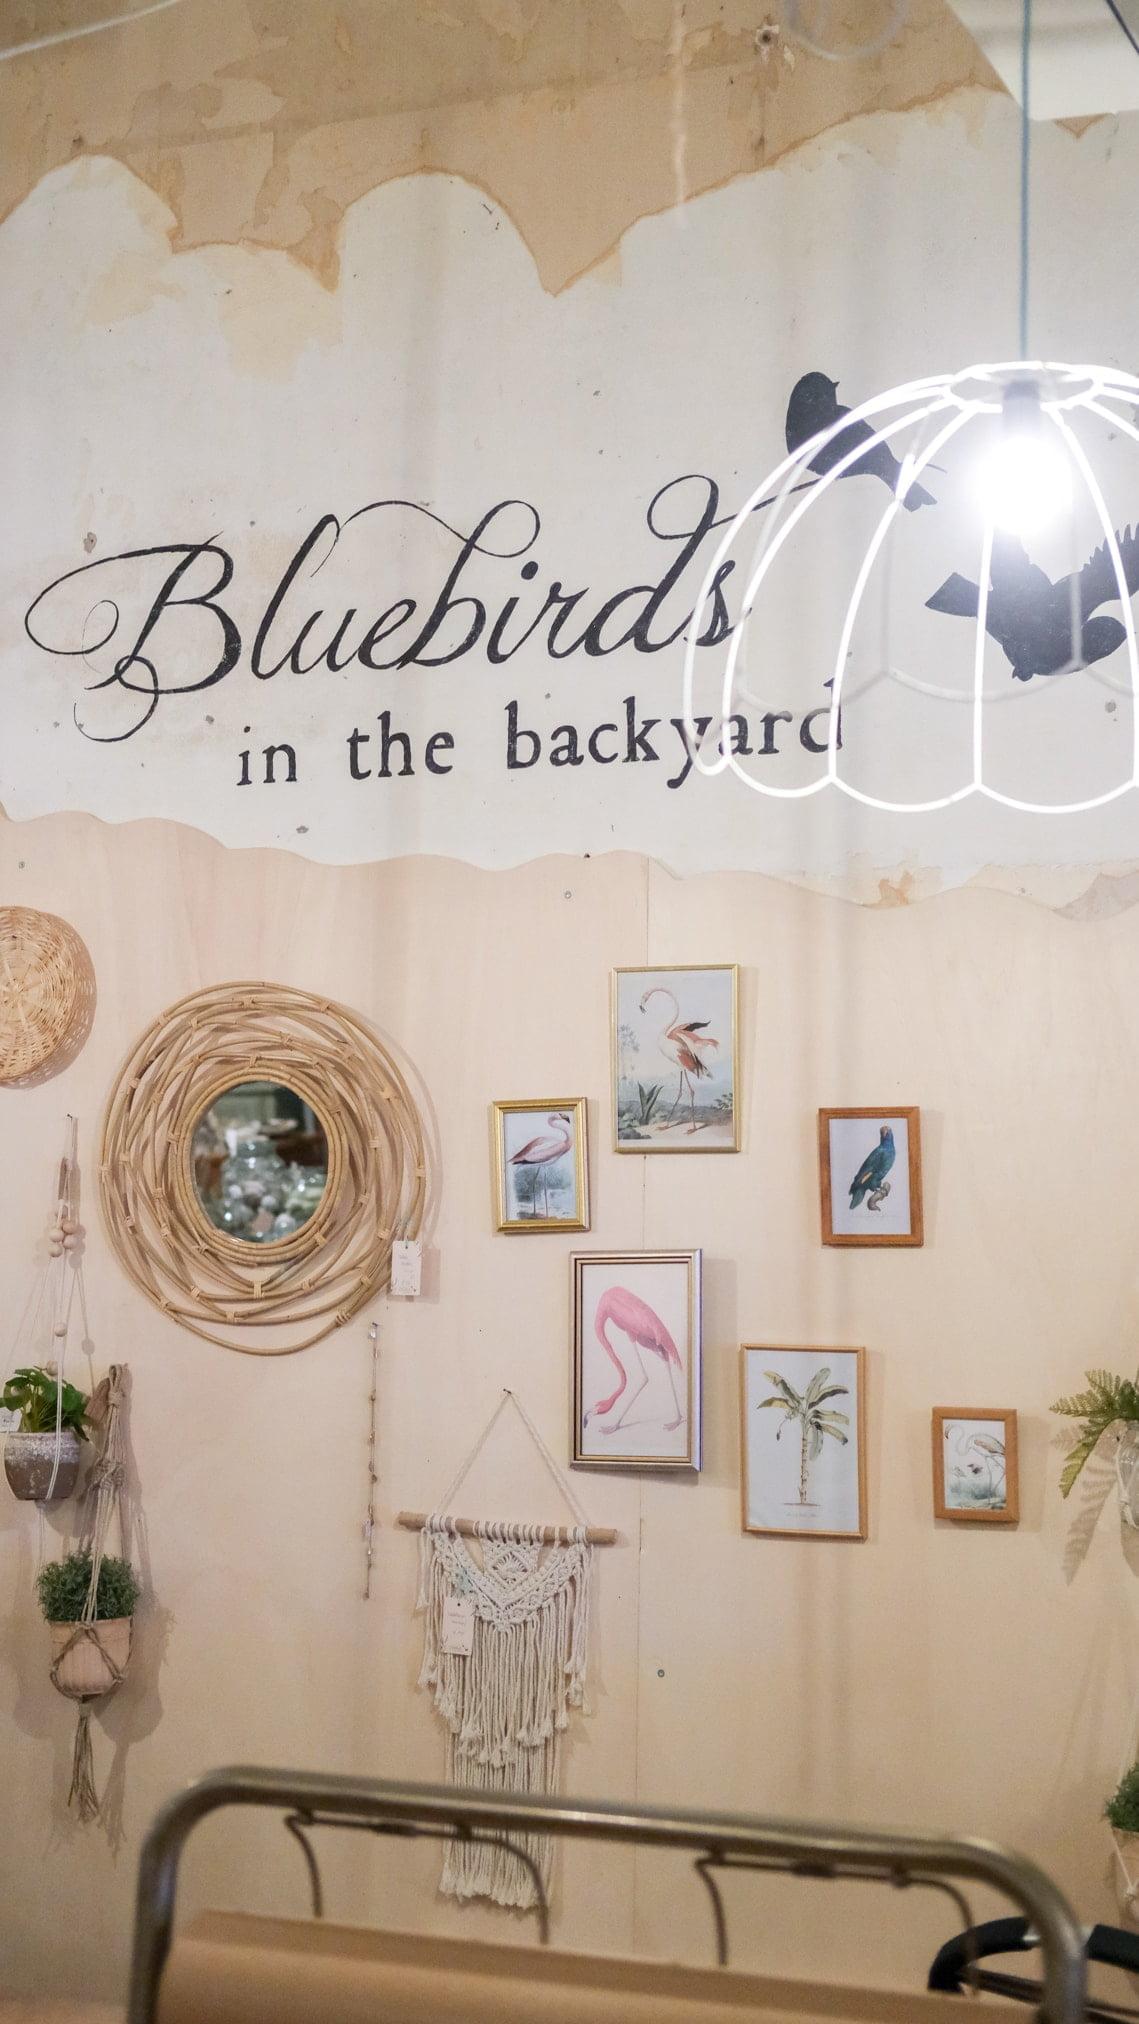 bluebirds in the backyard dordrecht